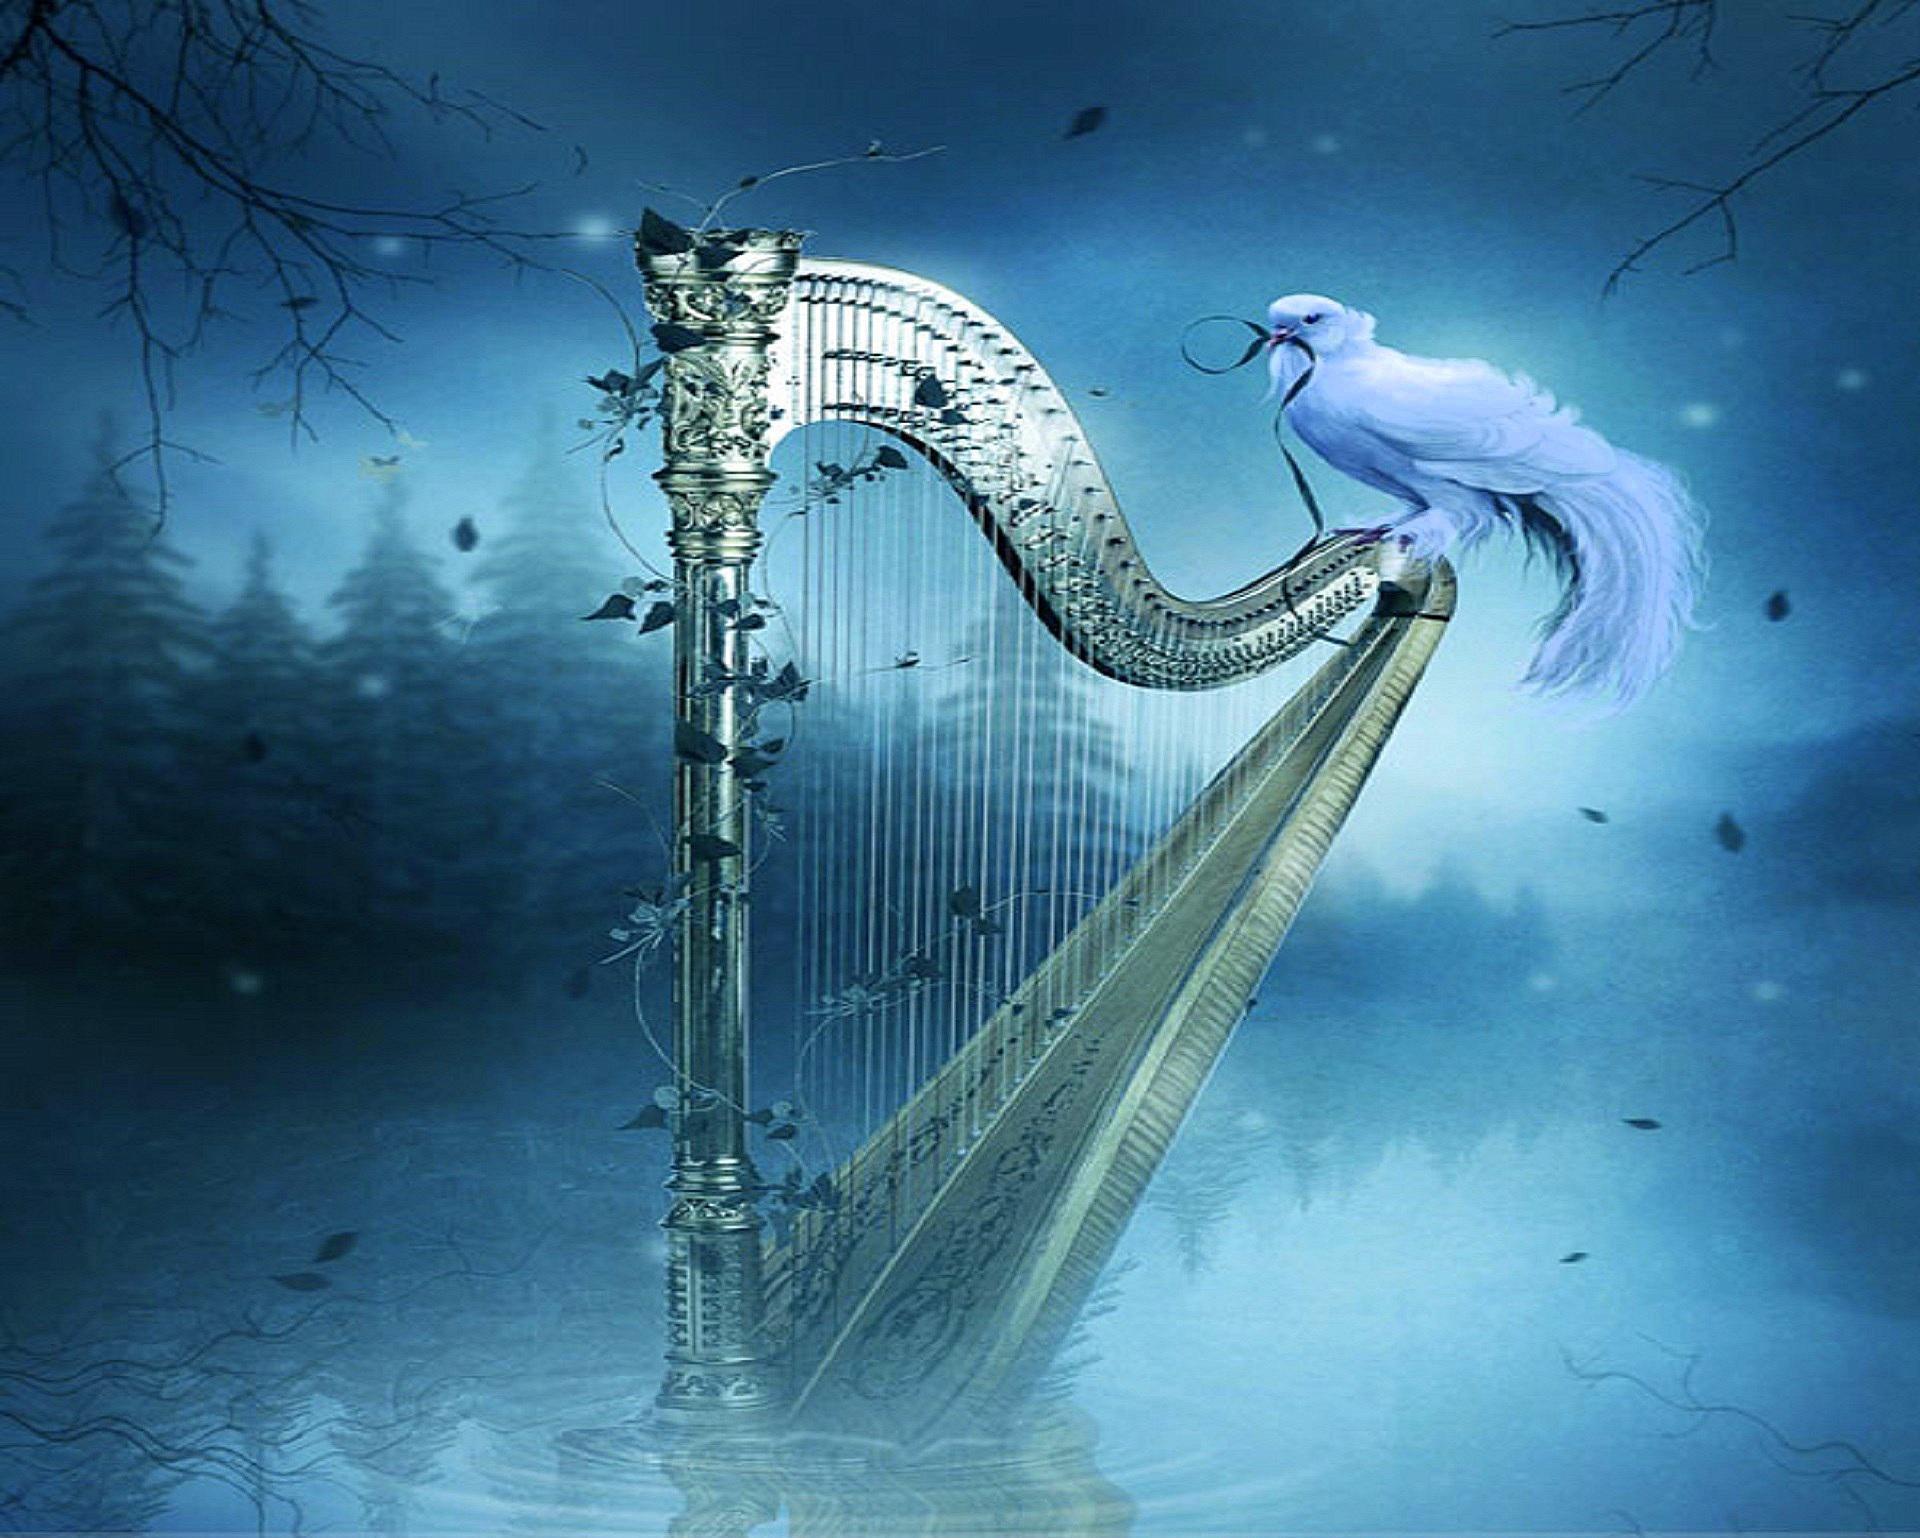 Best 49 Harp Wallpaper on HipWallpaper Sharp Wallpaper Harp 1920x1538